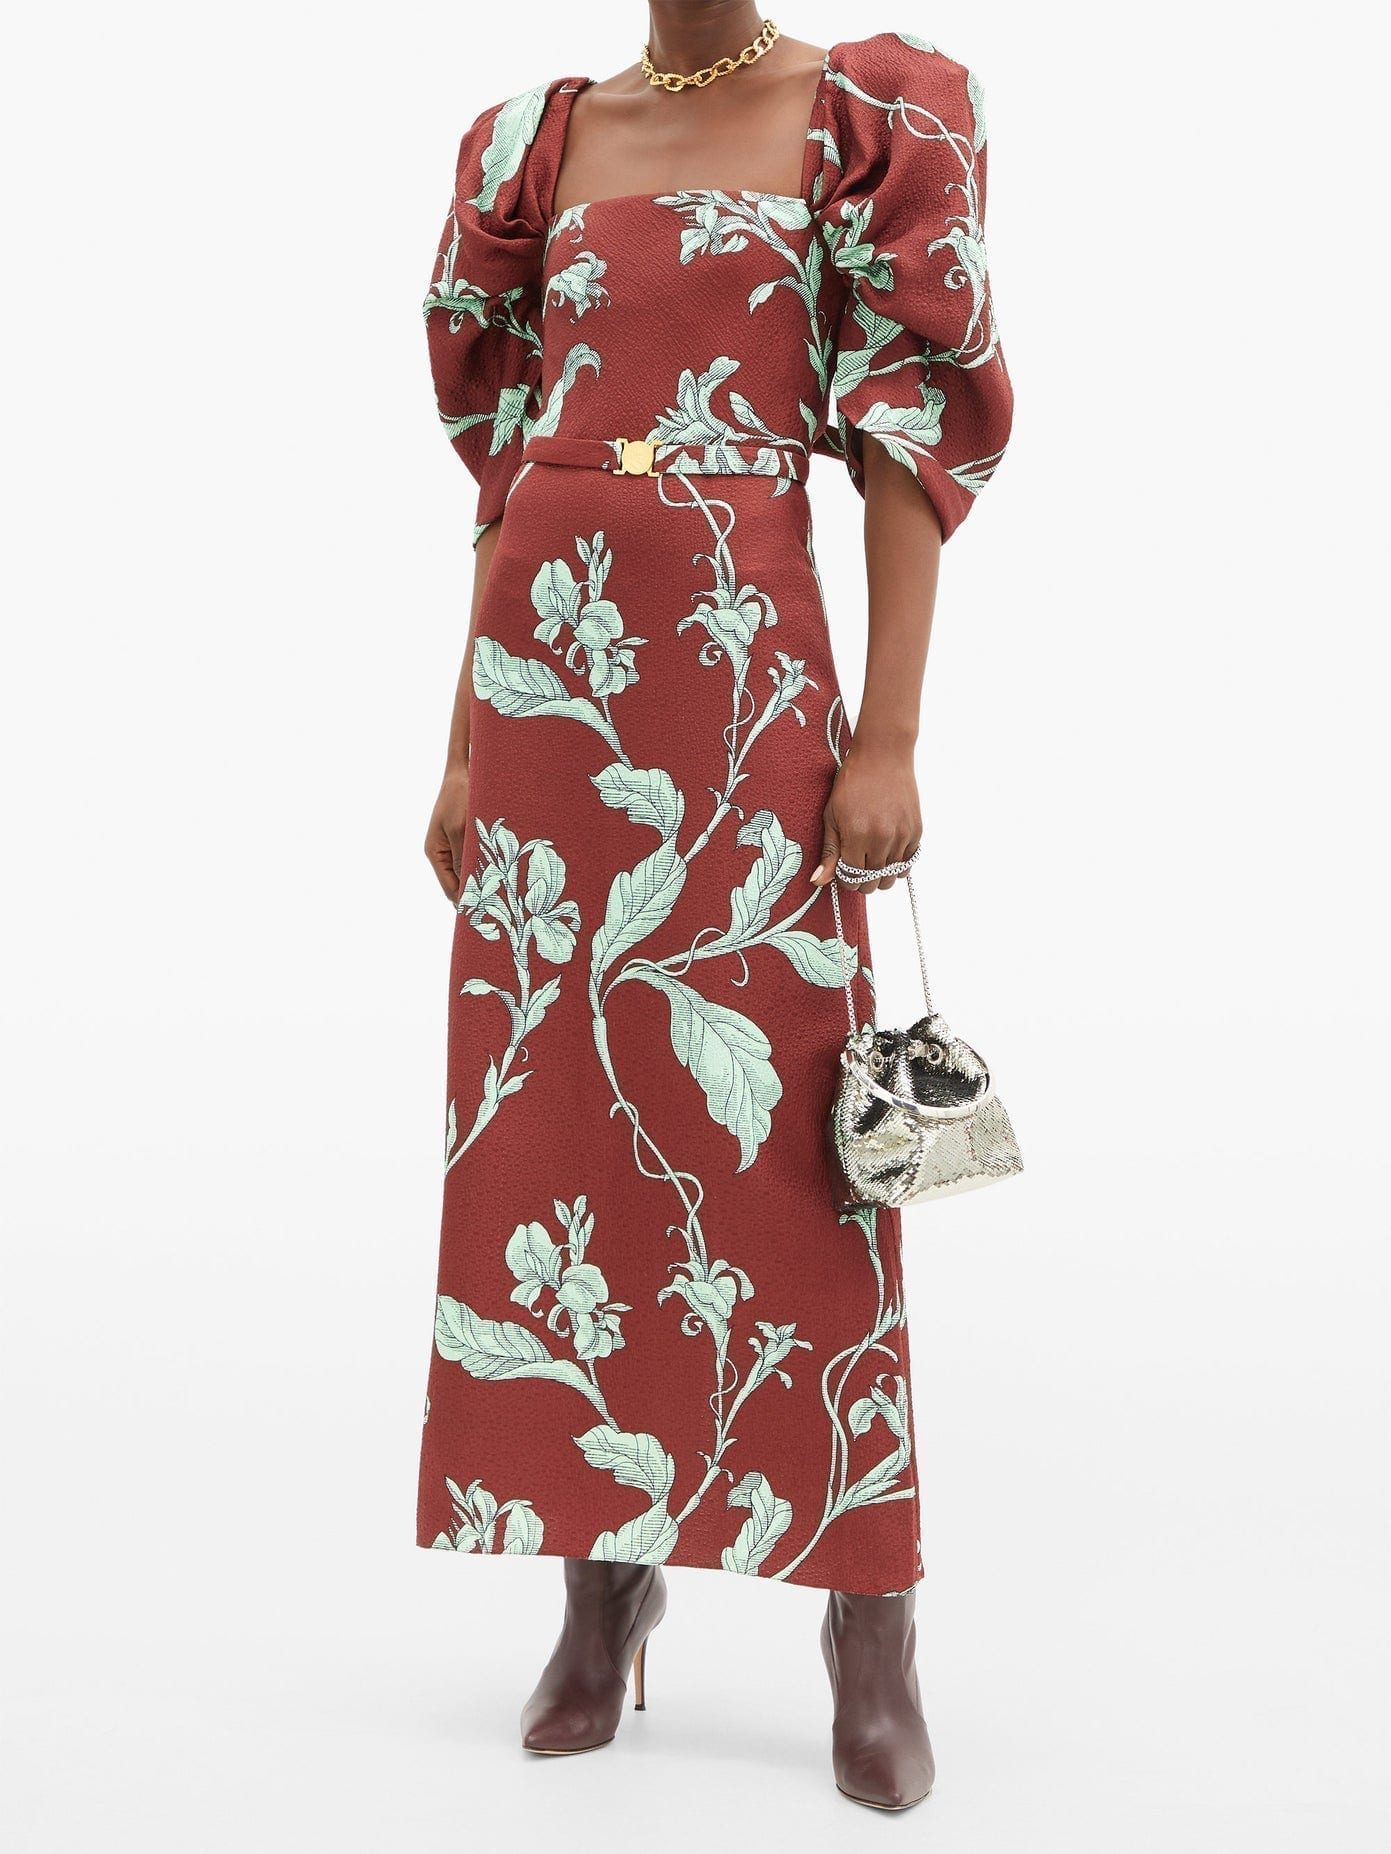 JOHANNA ORTIZ Rayo De Esperanza Belted Floral Jacquard Dress